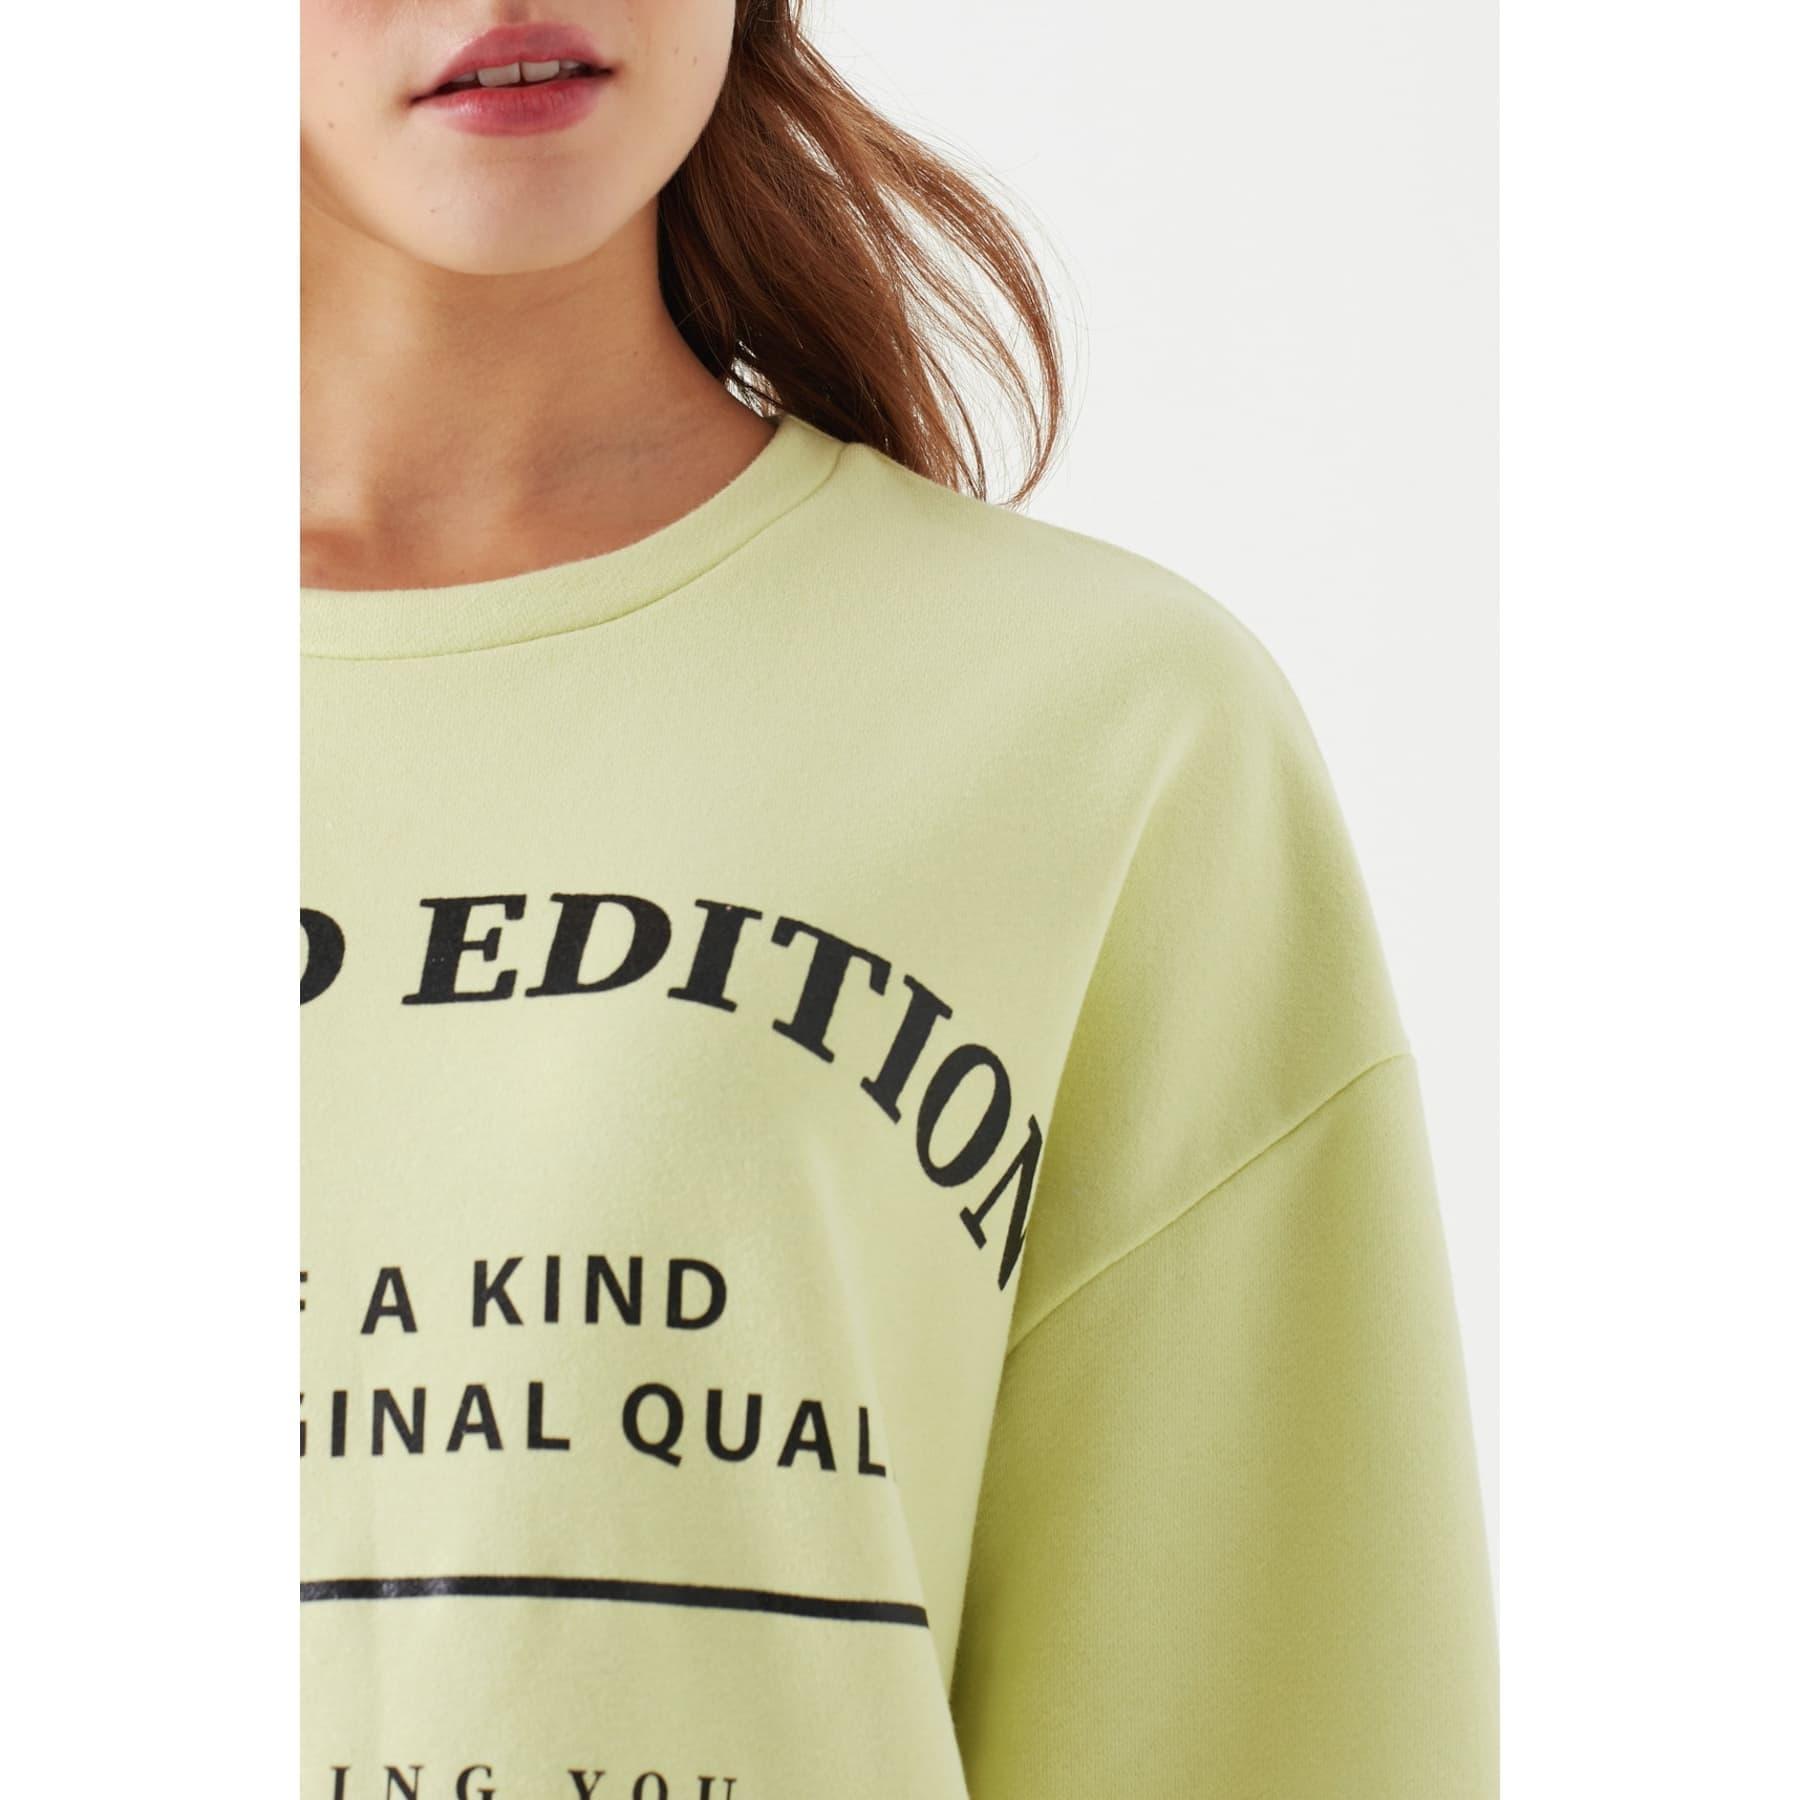 Mavi Limited Edition Baskılı Kadın Yeşil Sweatshirt